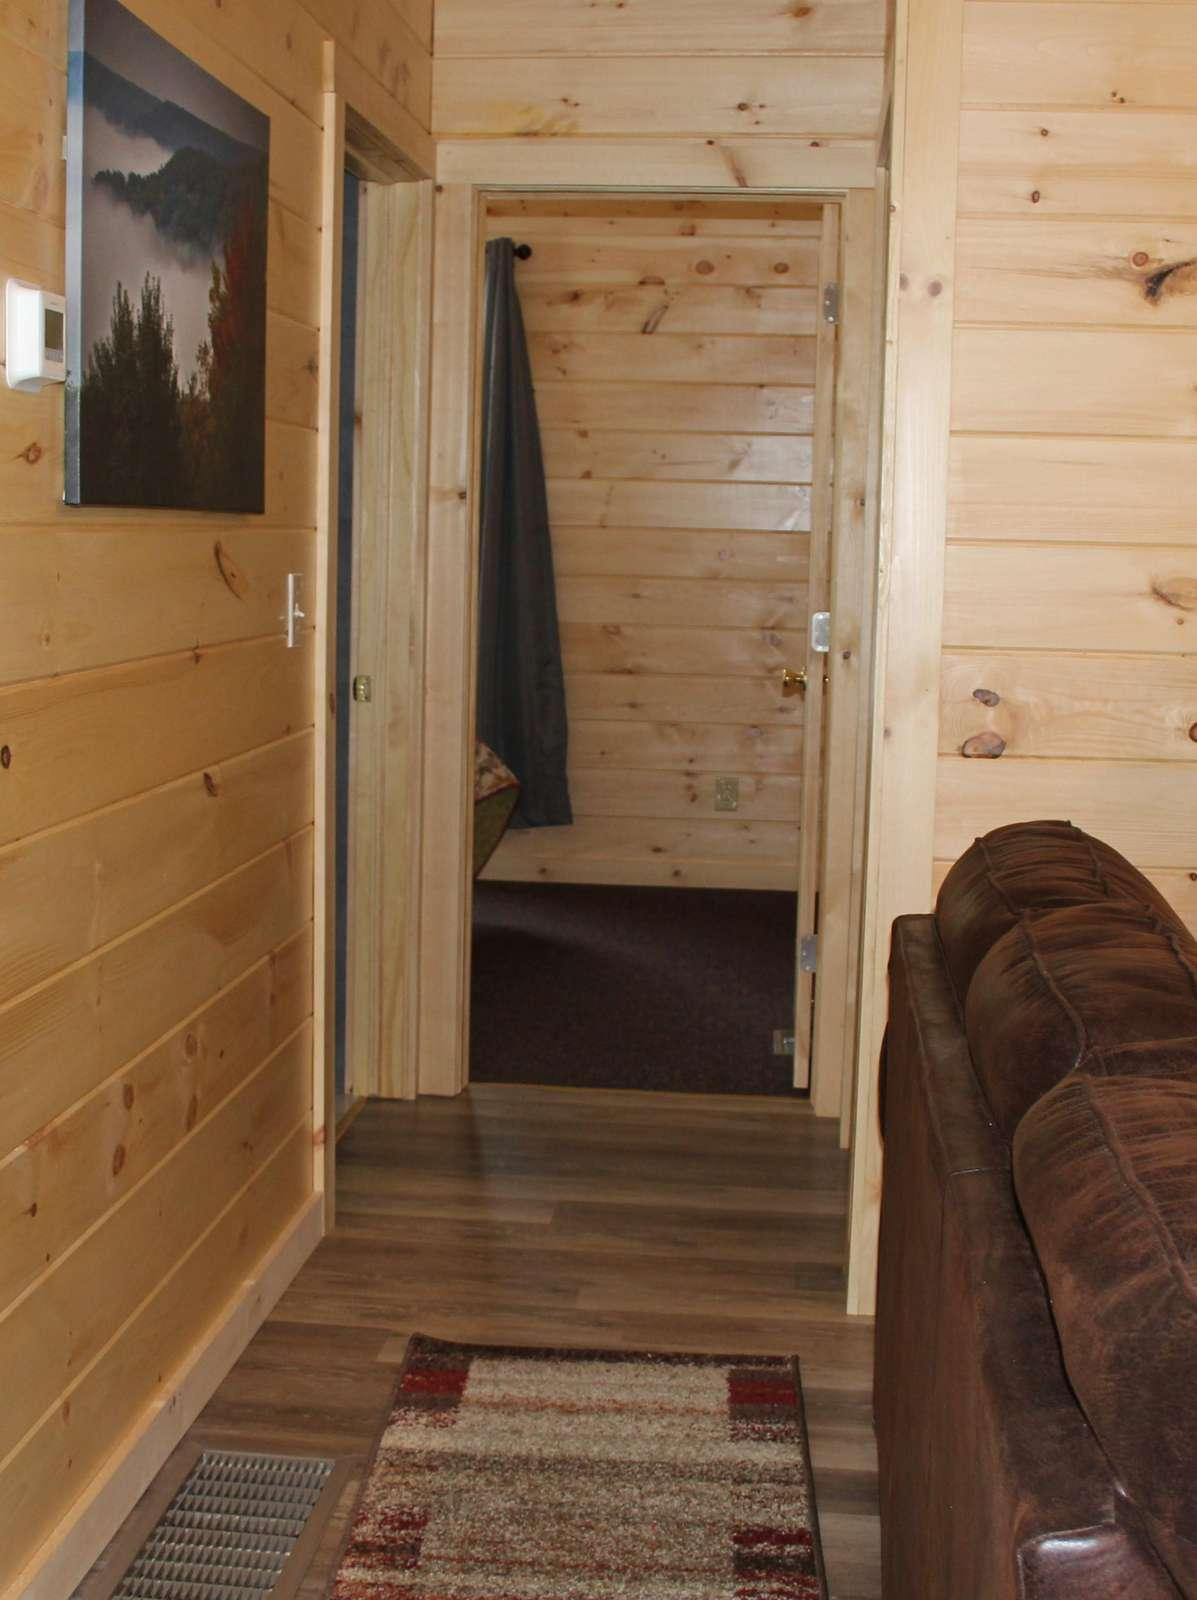 Hallway to Bedrooms and Bathroom